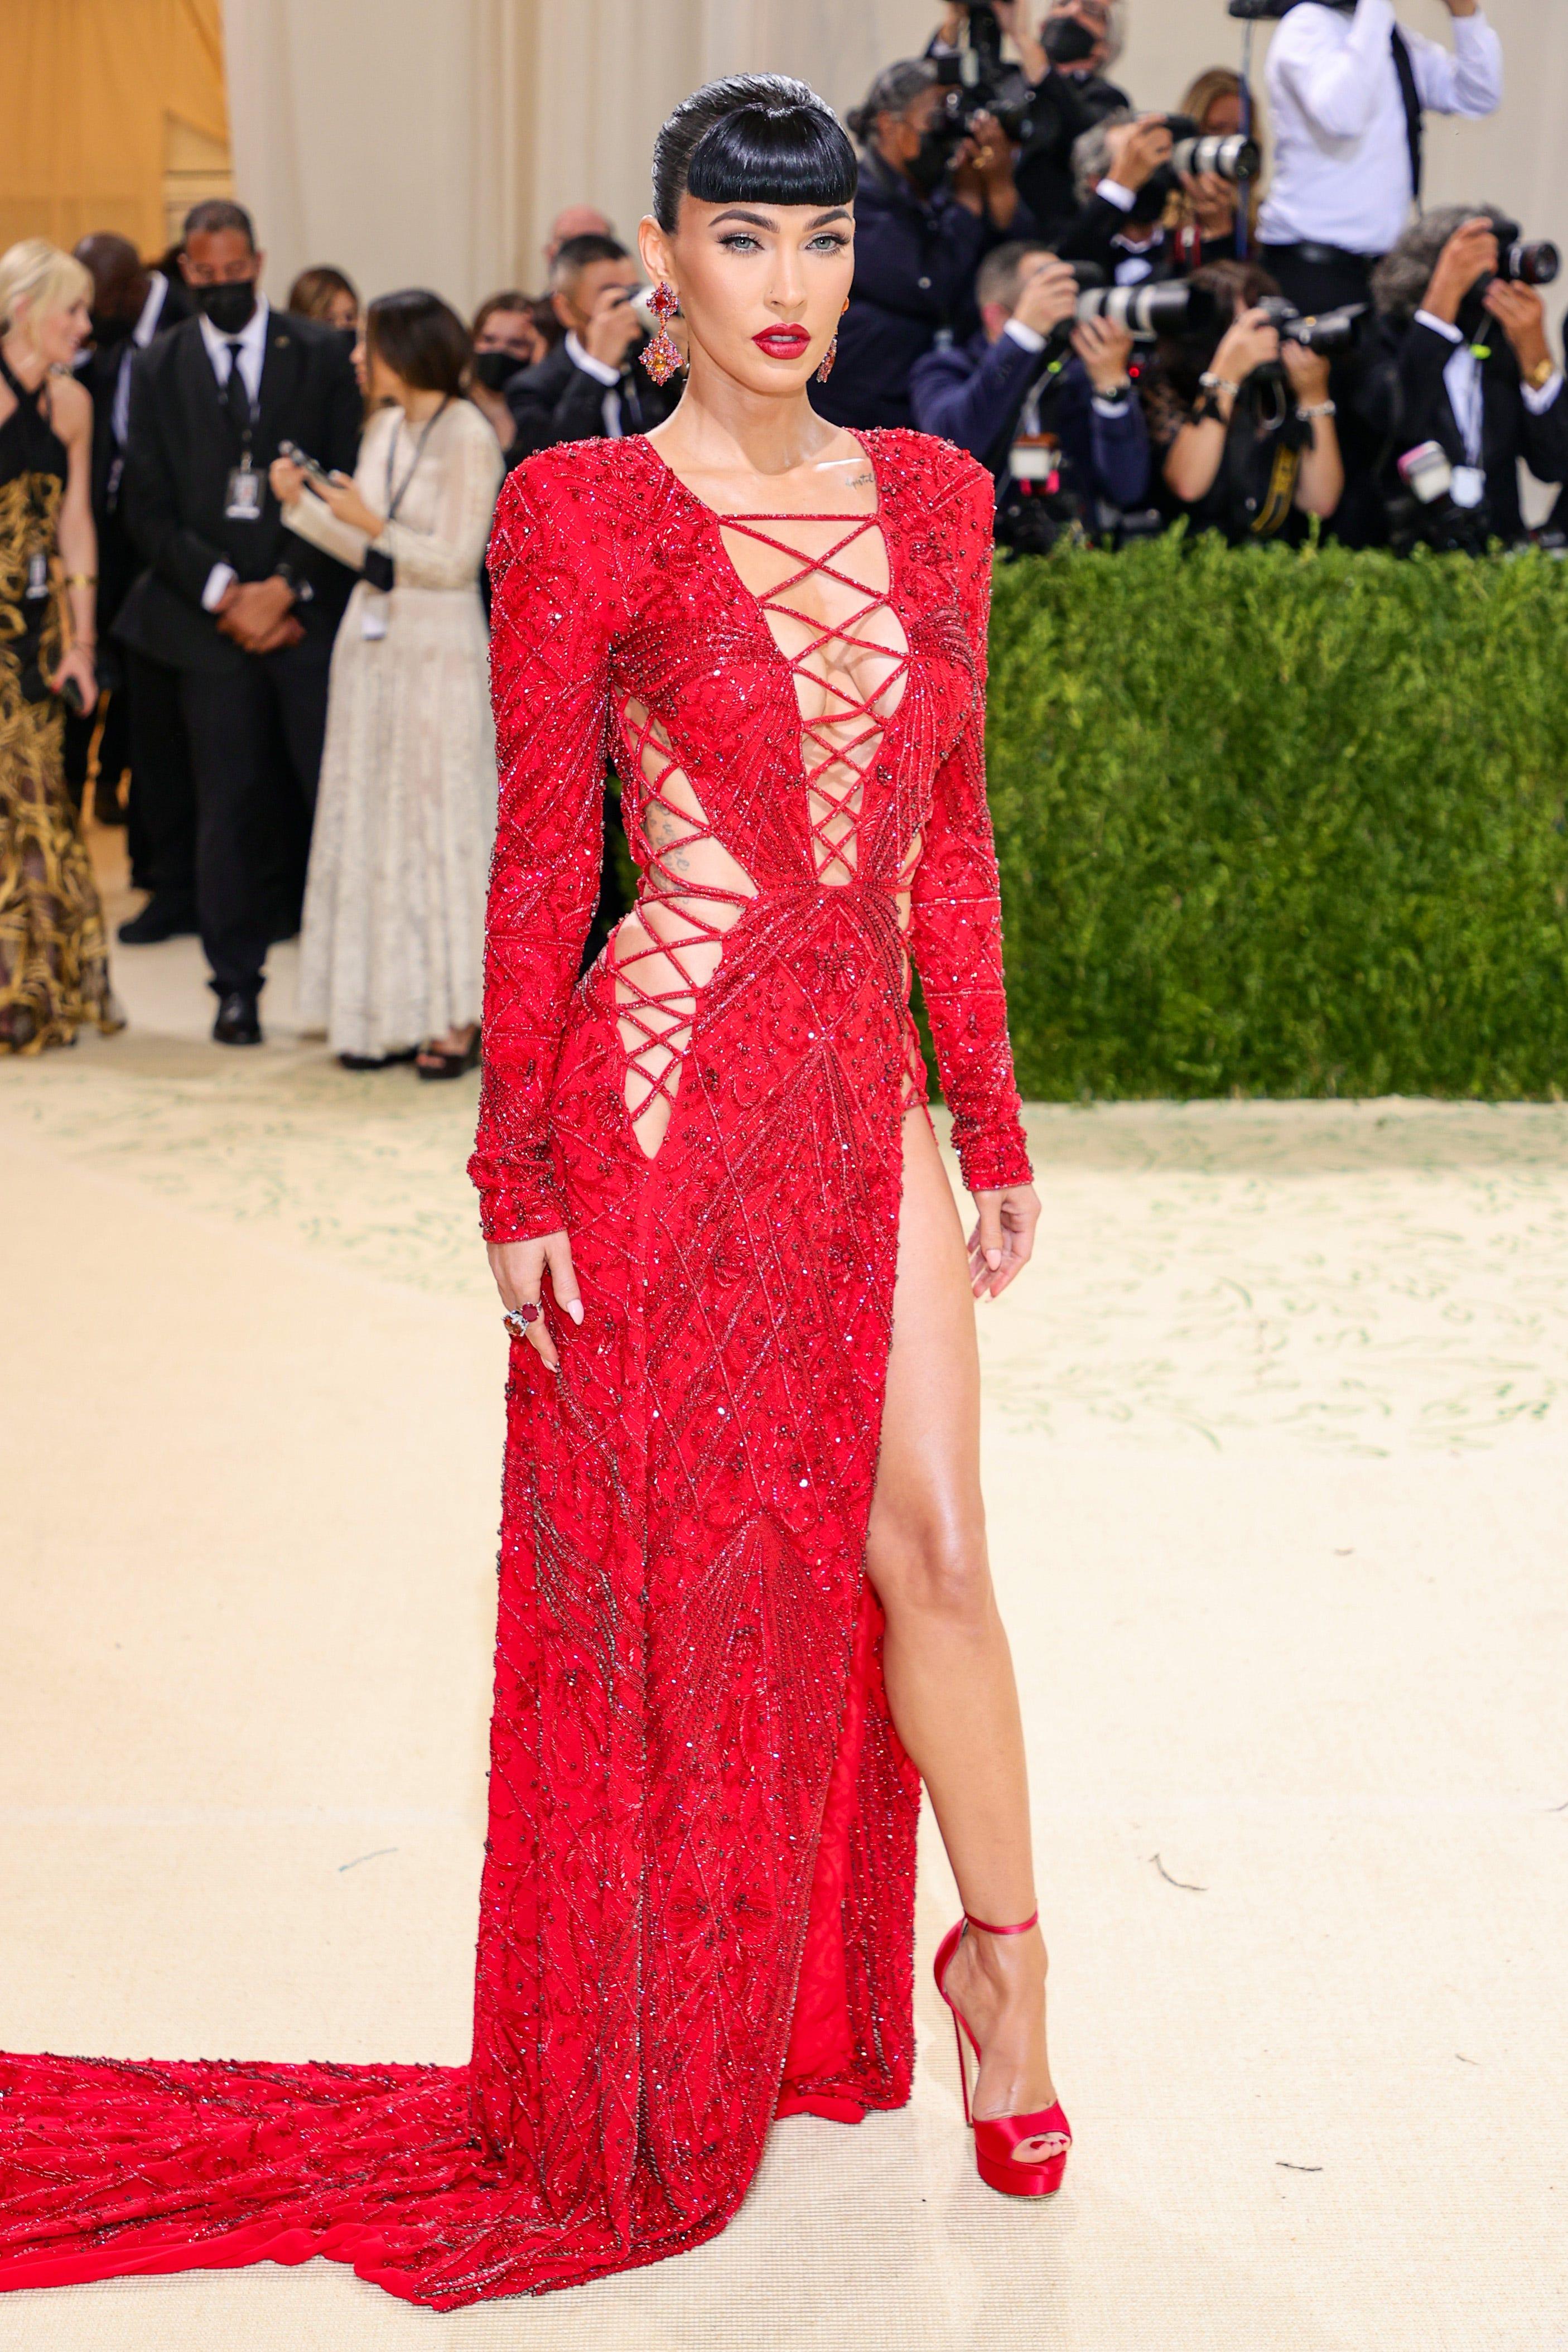 Met Gala 2021: Megan Fox, Rihanna, Kim Kardashian, AOC, more wild red-carpet looks